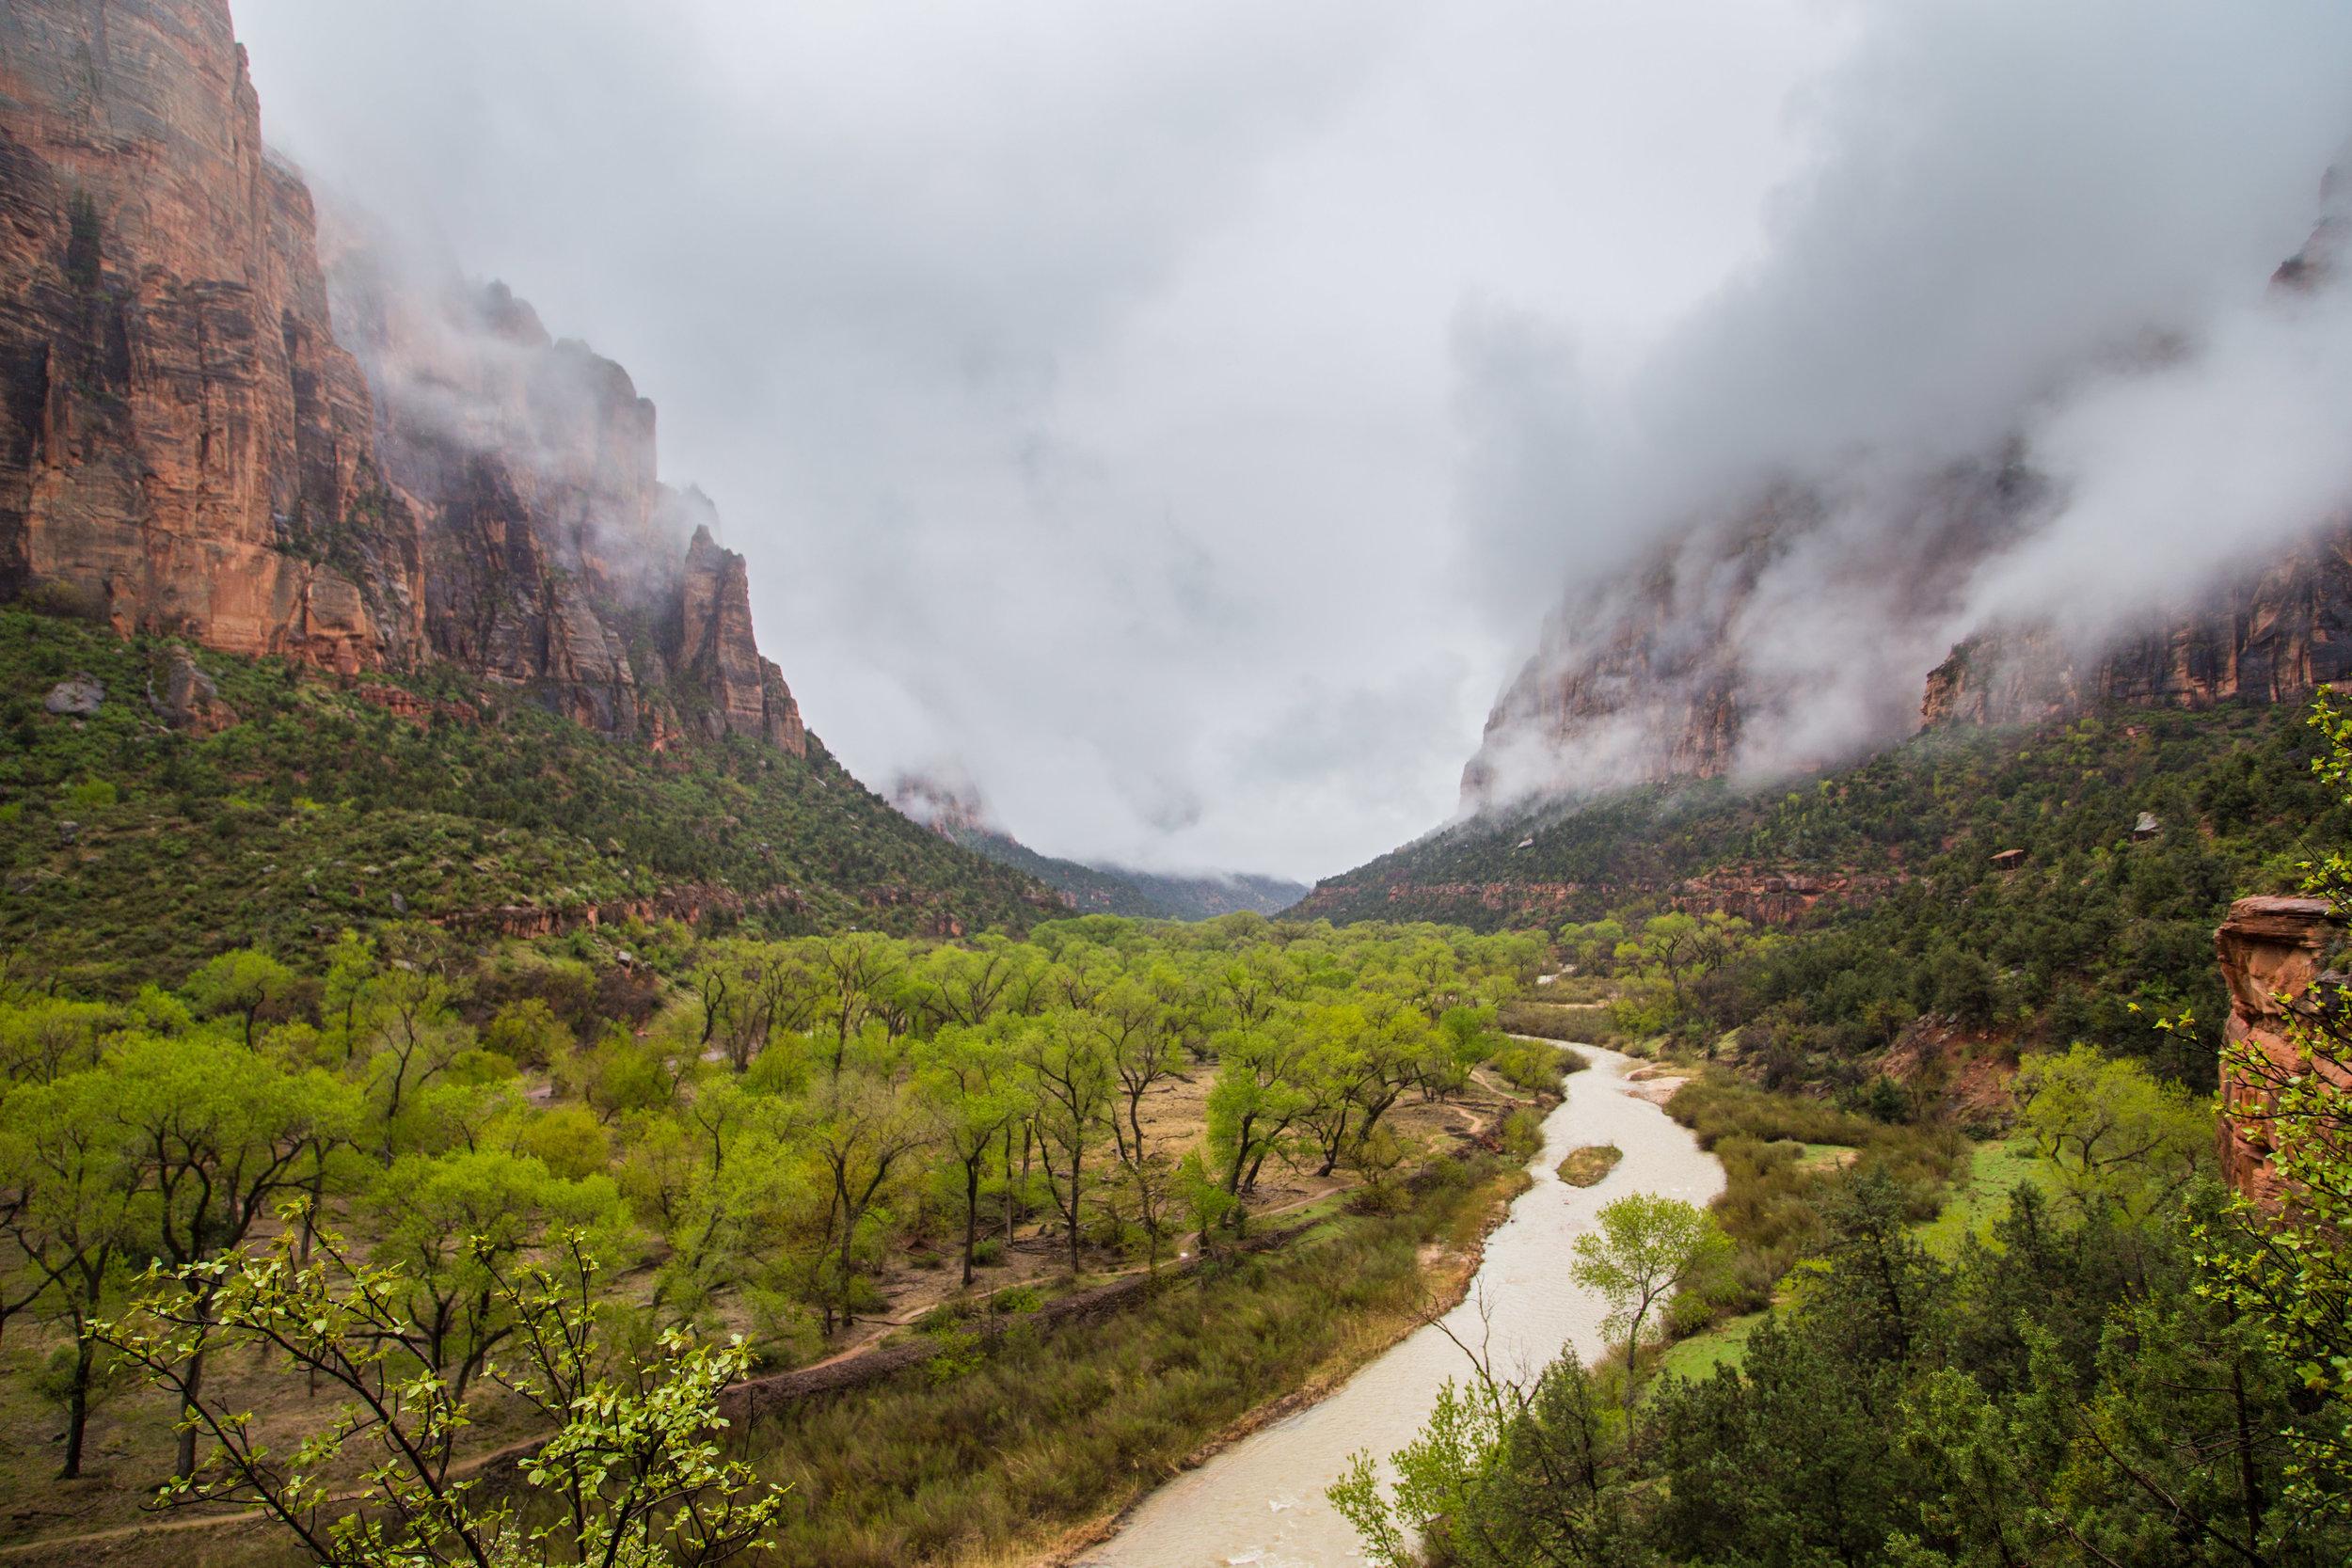 View from Kayenta Trail